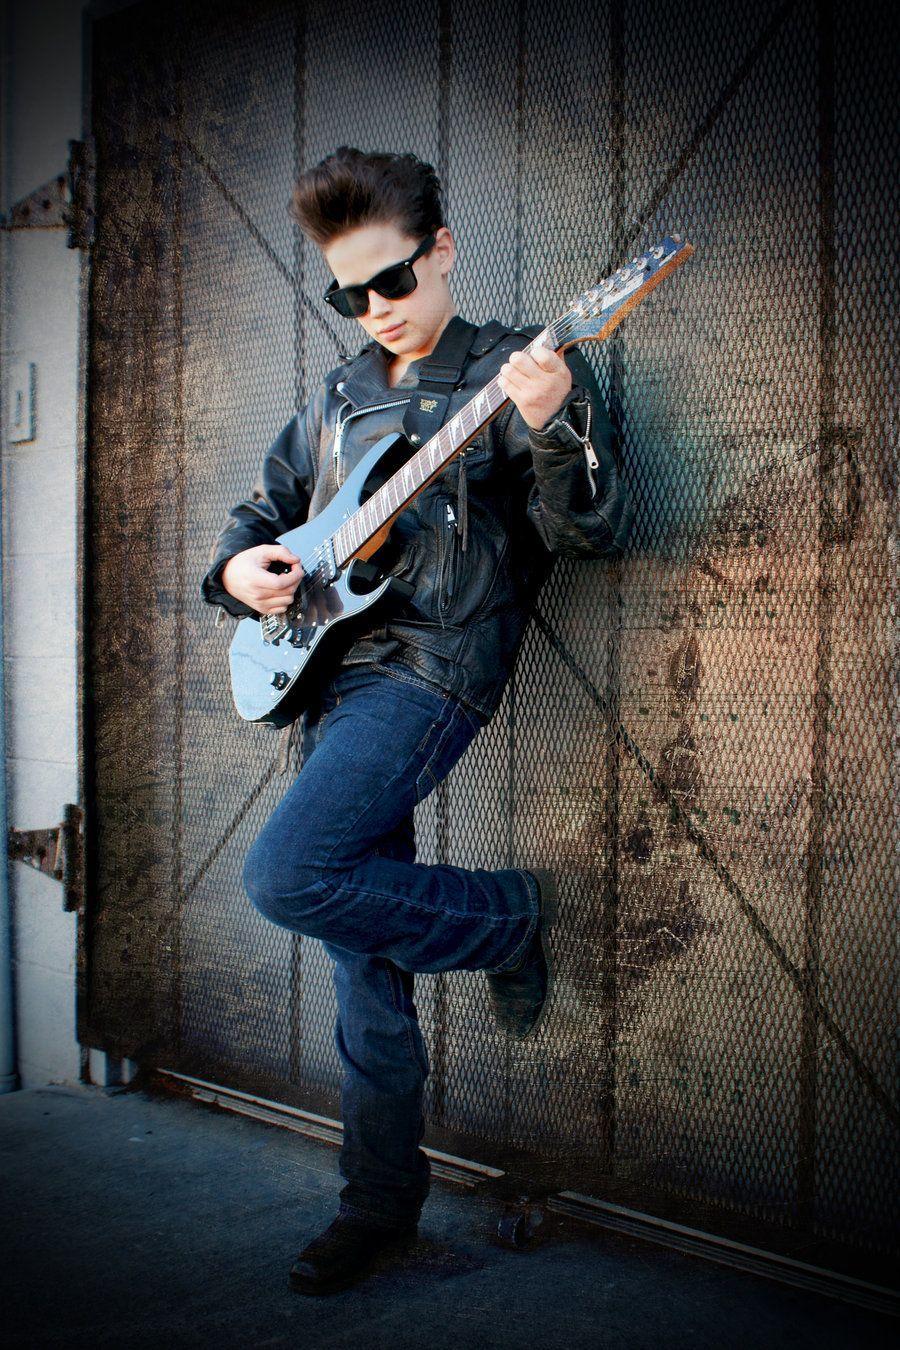 Guitar Boy Wallpapers HD - Wallpaper Cave